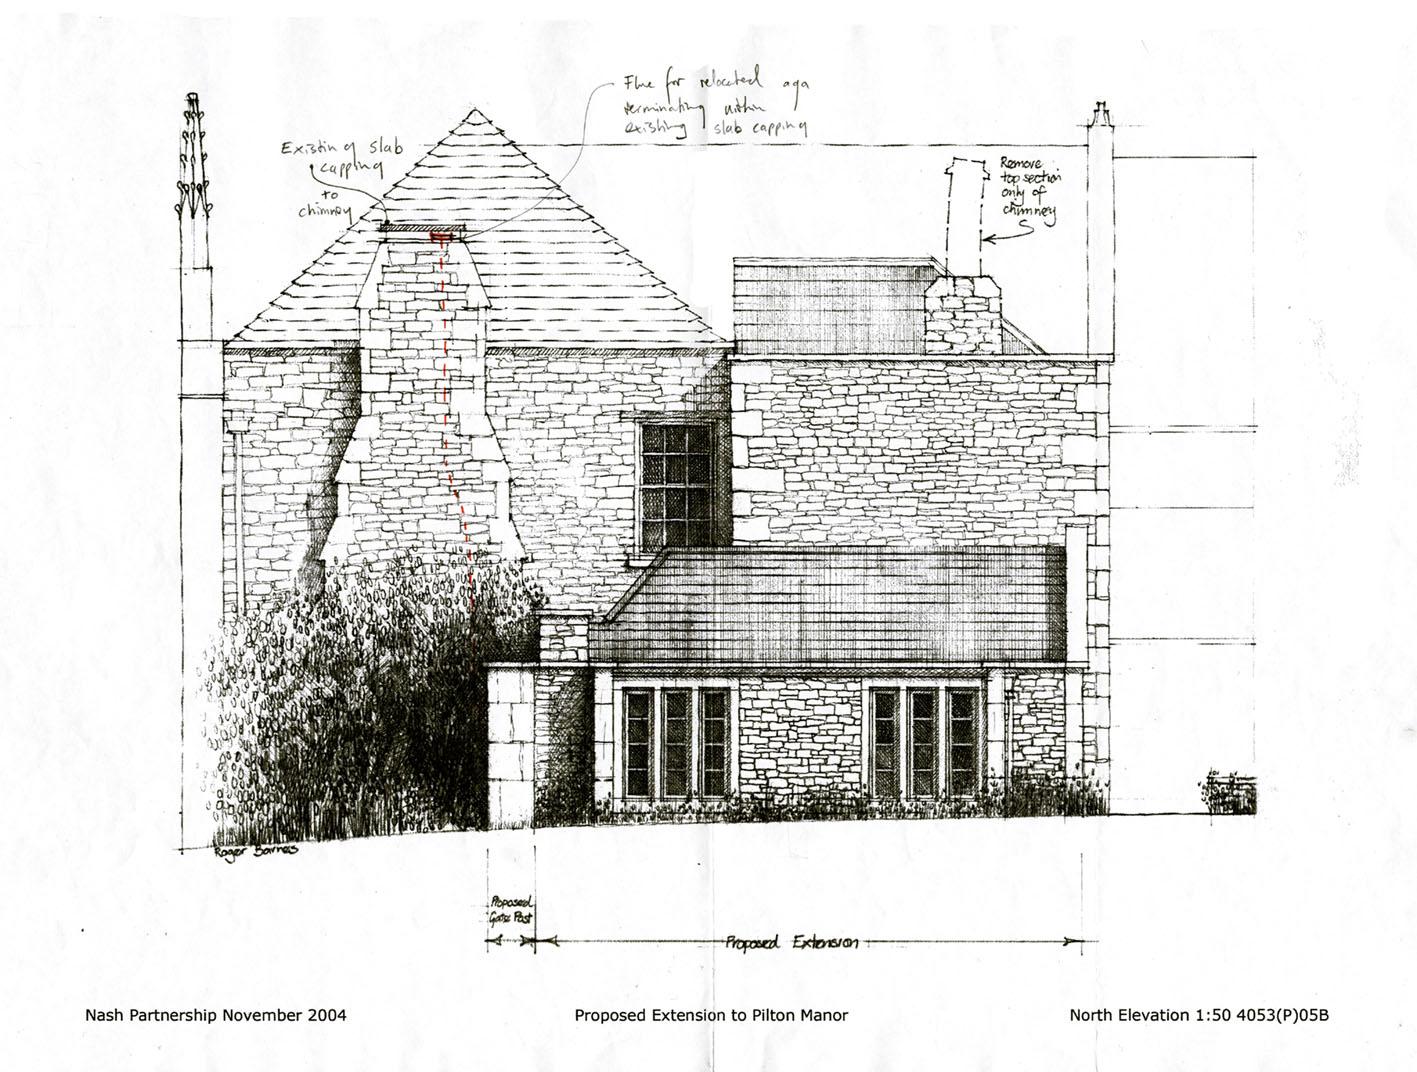 NEW BUILD KITCHEN EXTENSION, PILTON MANOR GRADE I LISTED BUILDING, PILTON, UK